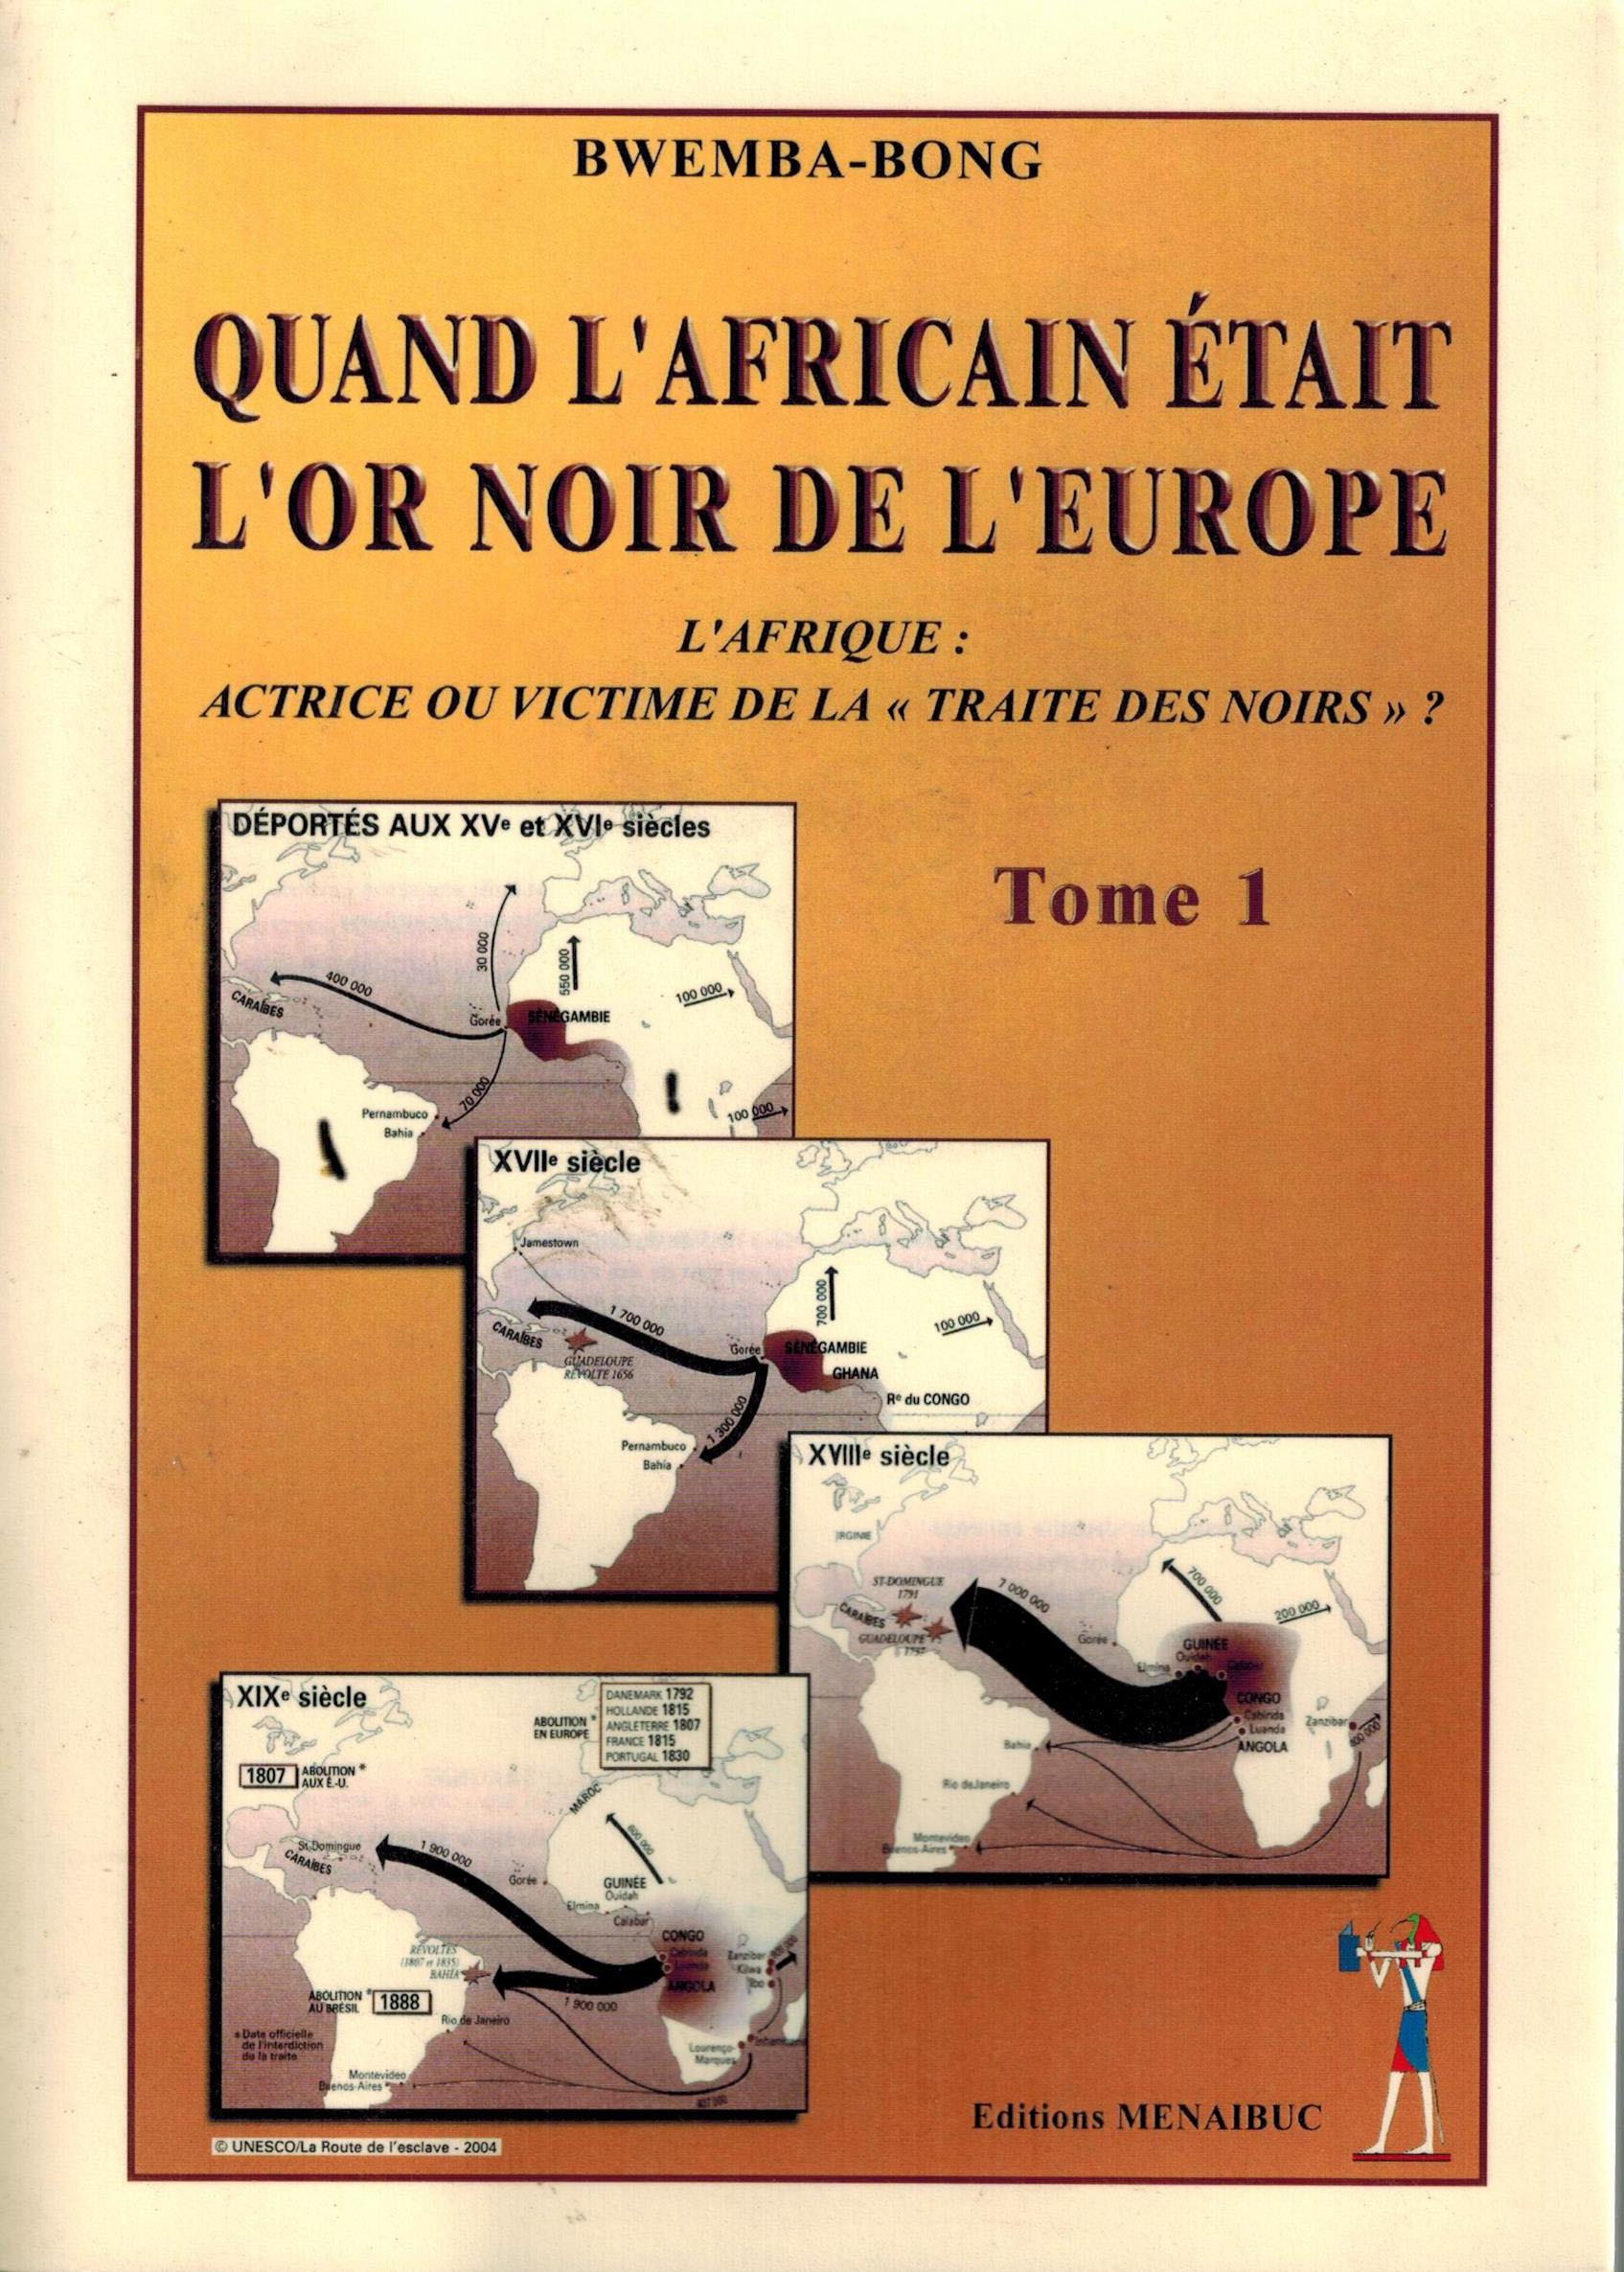 QUAND L'AFRICAIN ETAIT L'OR NO